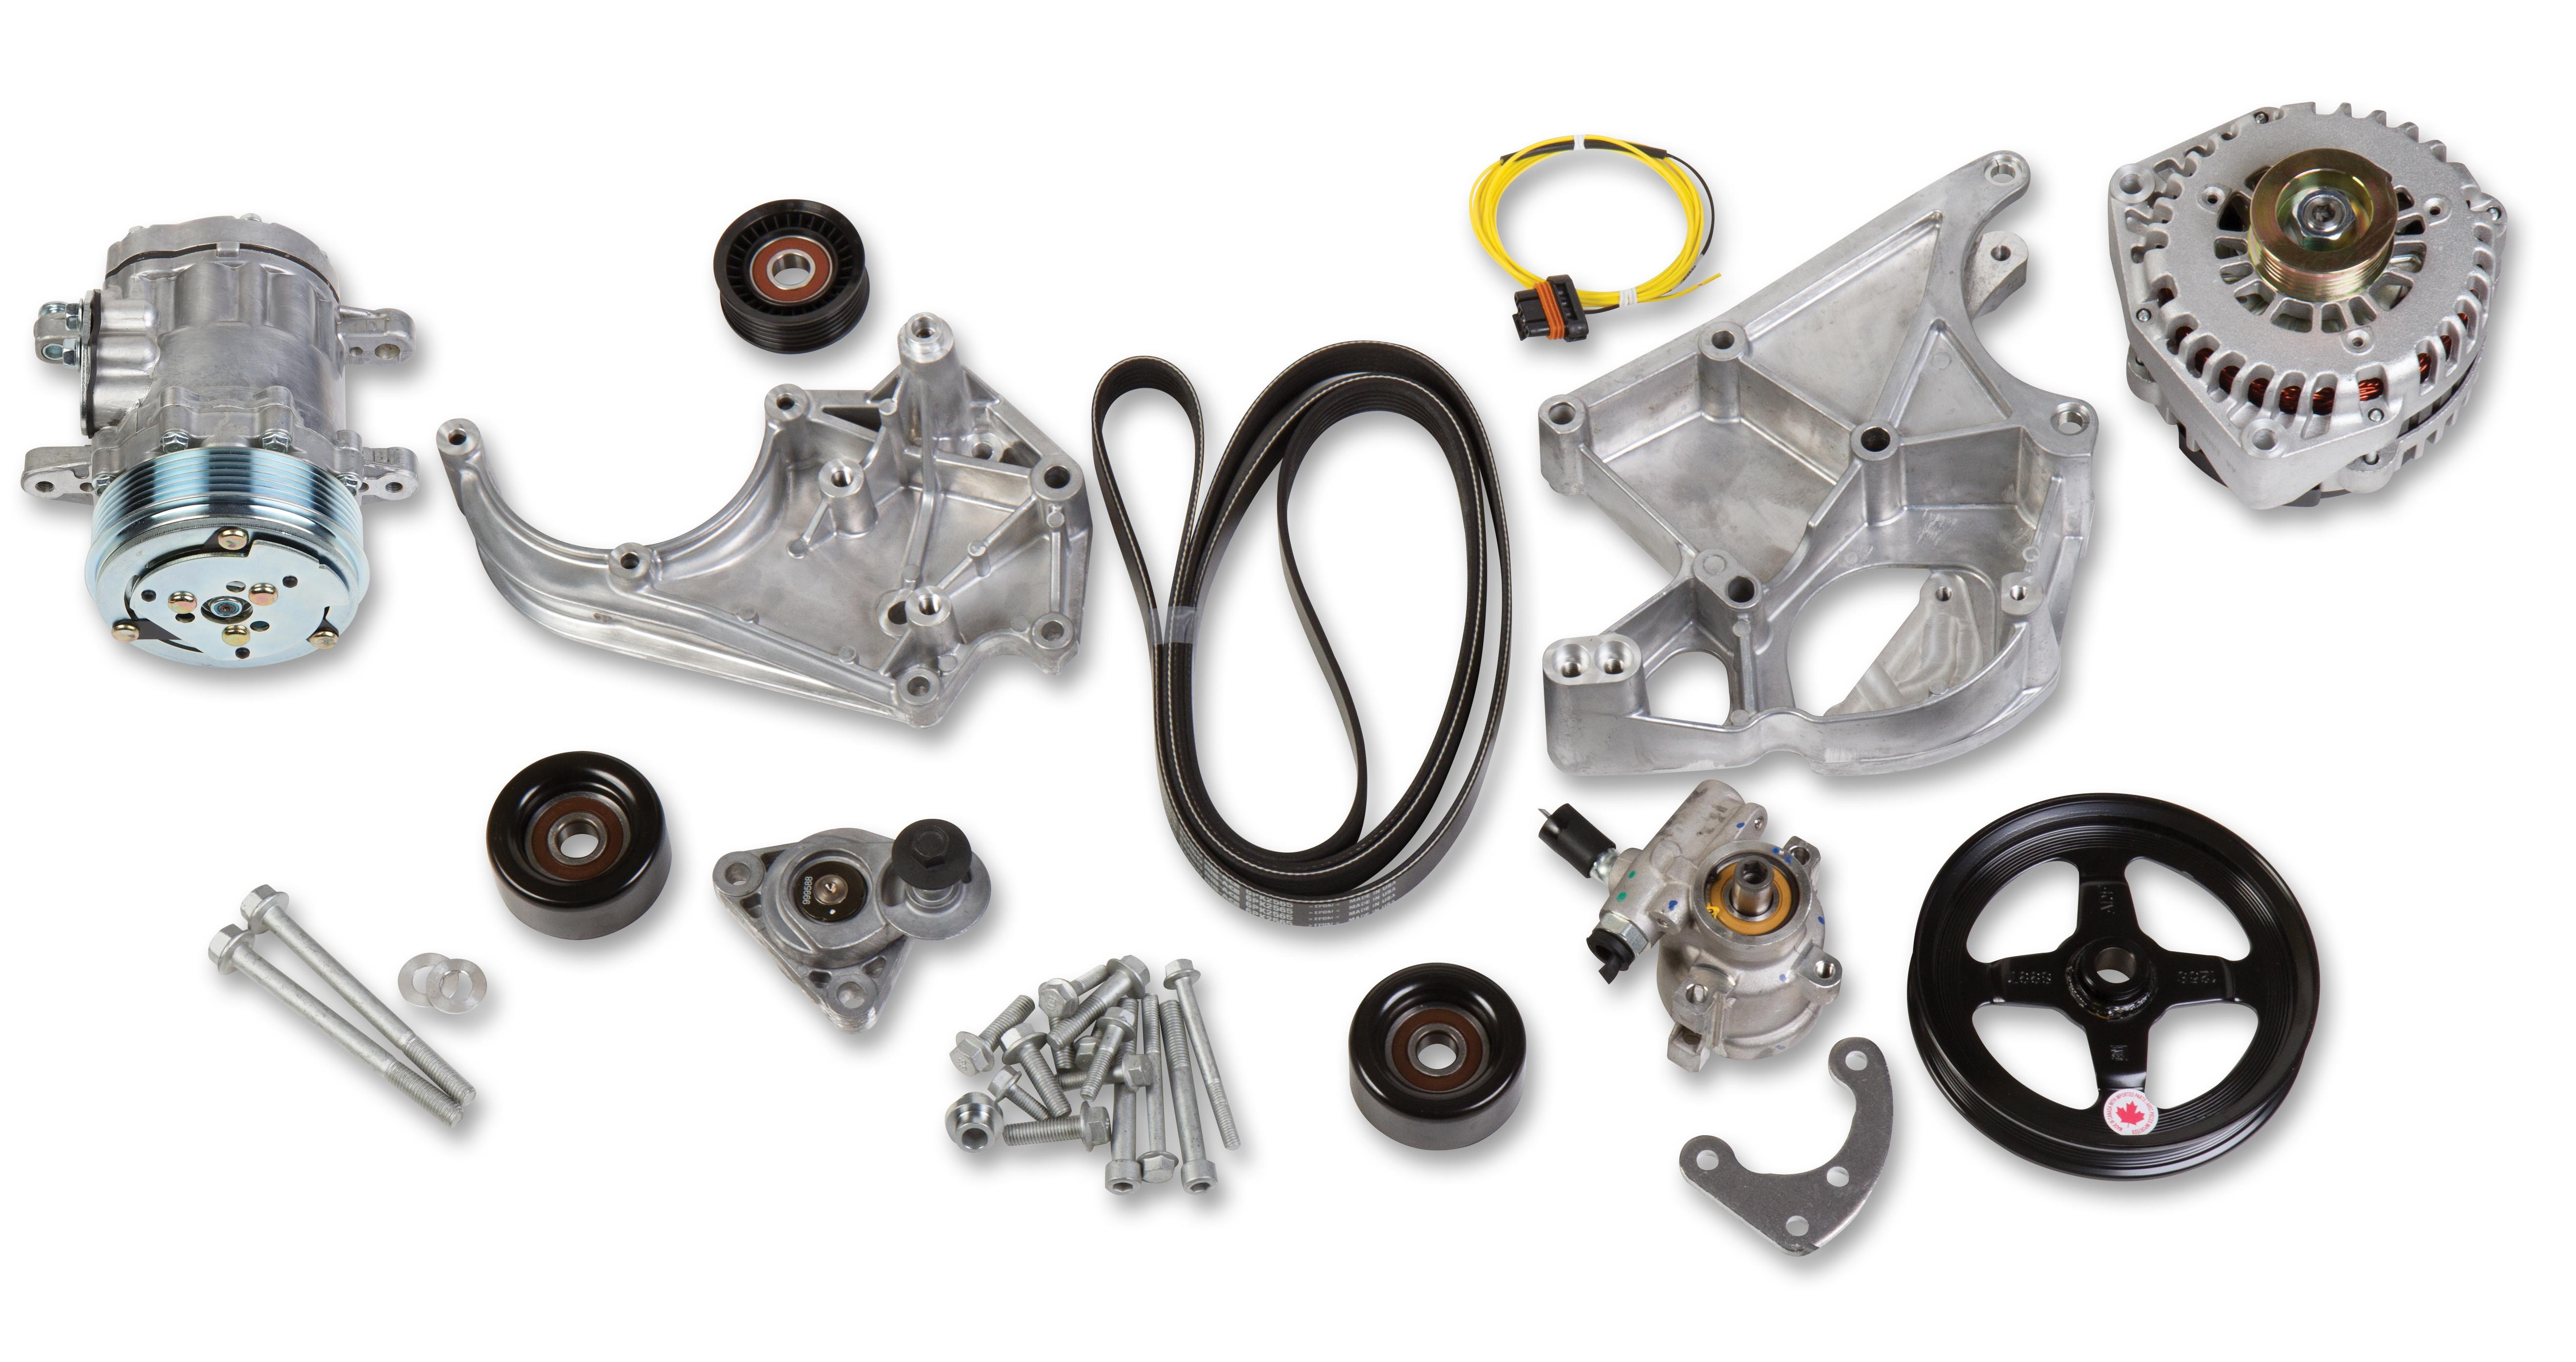 Chevy S10 Ls Swap Kits